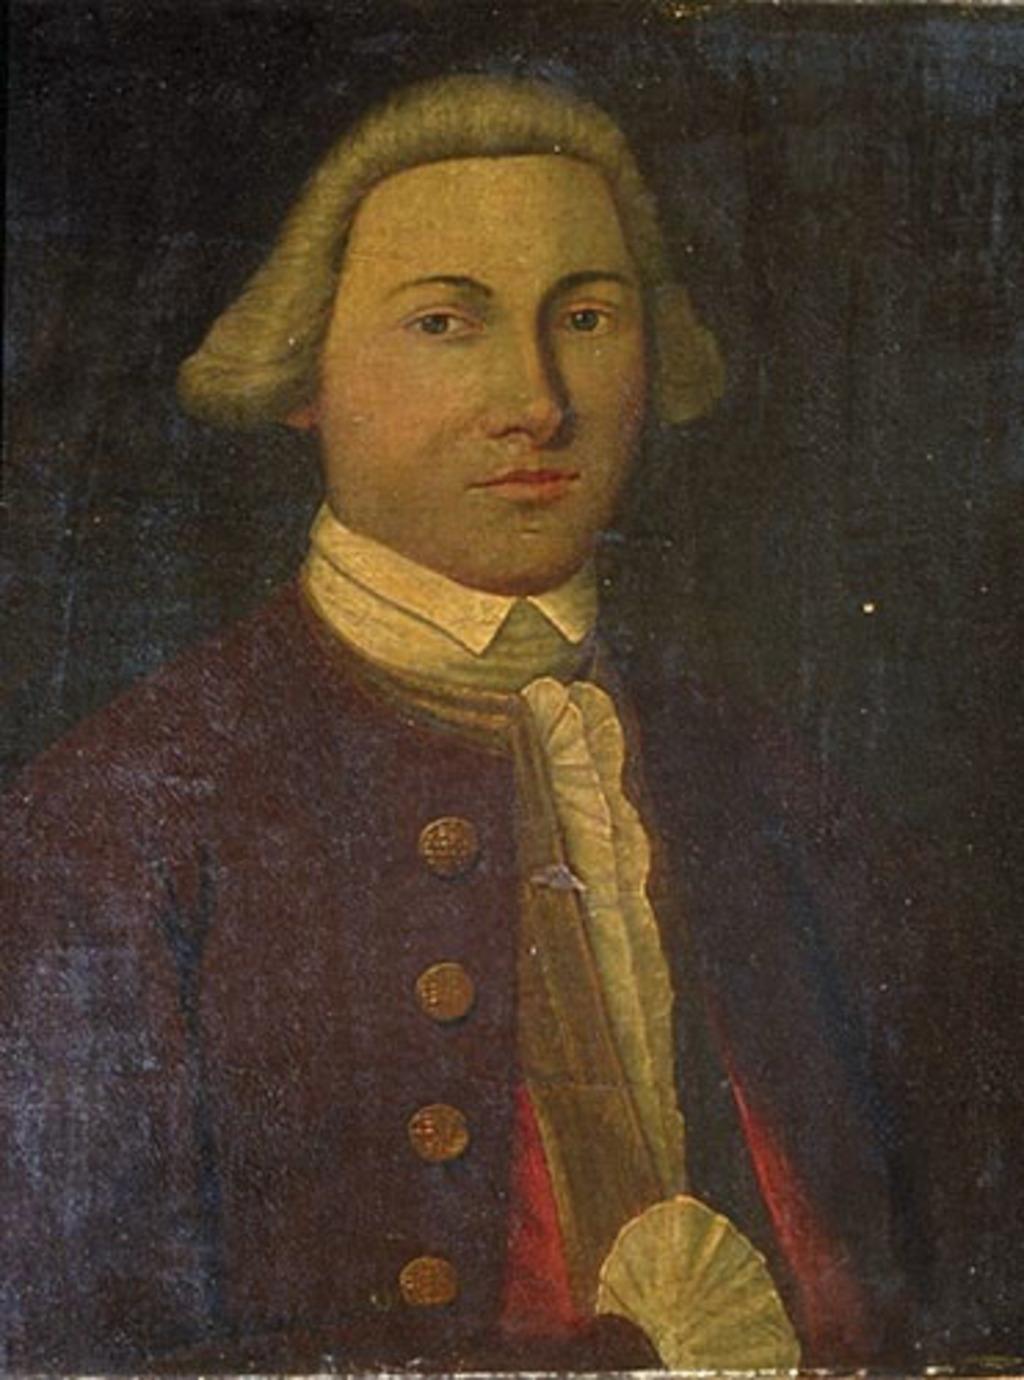 Edward Antill III